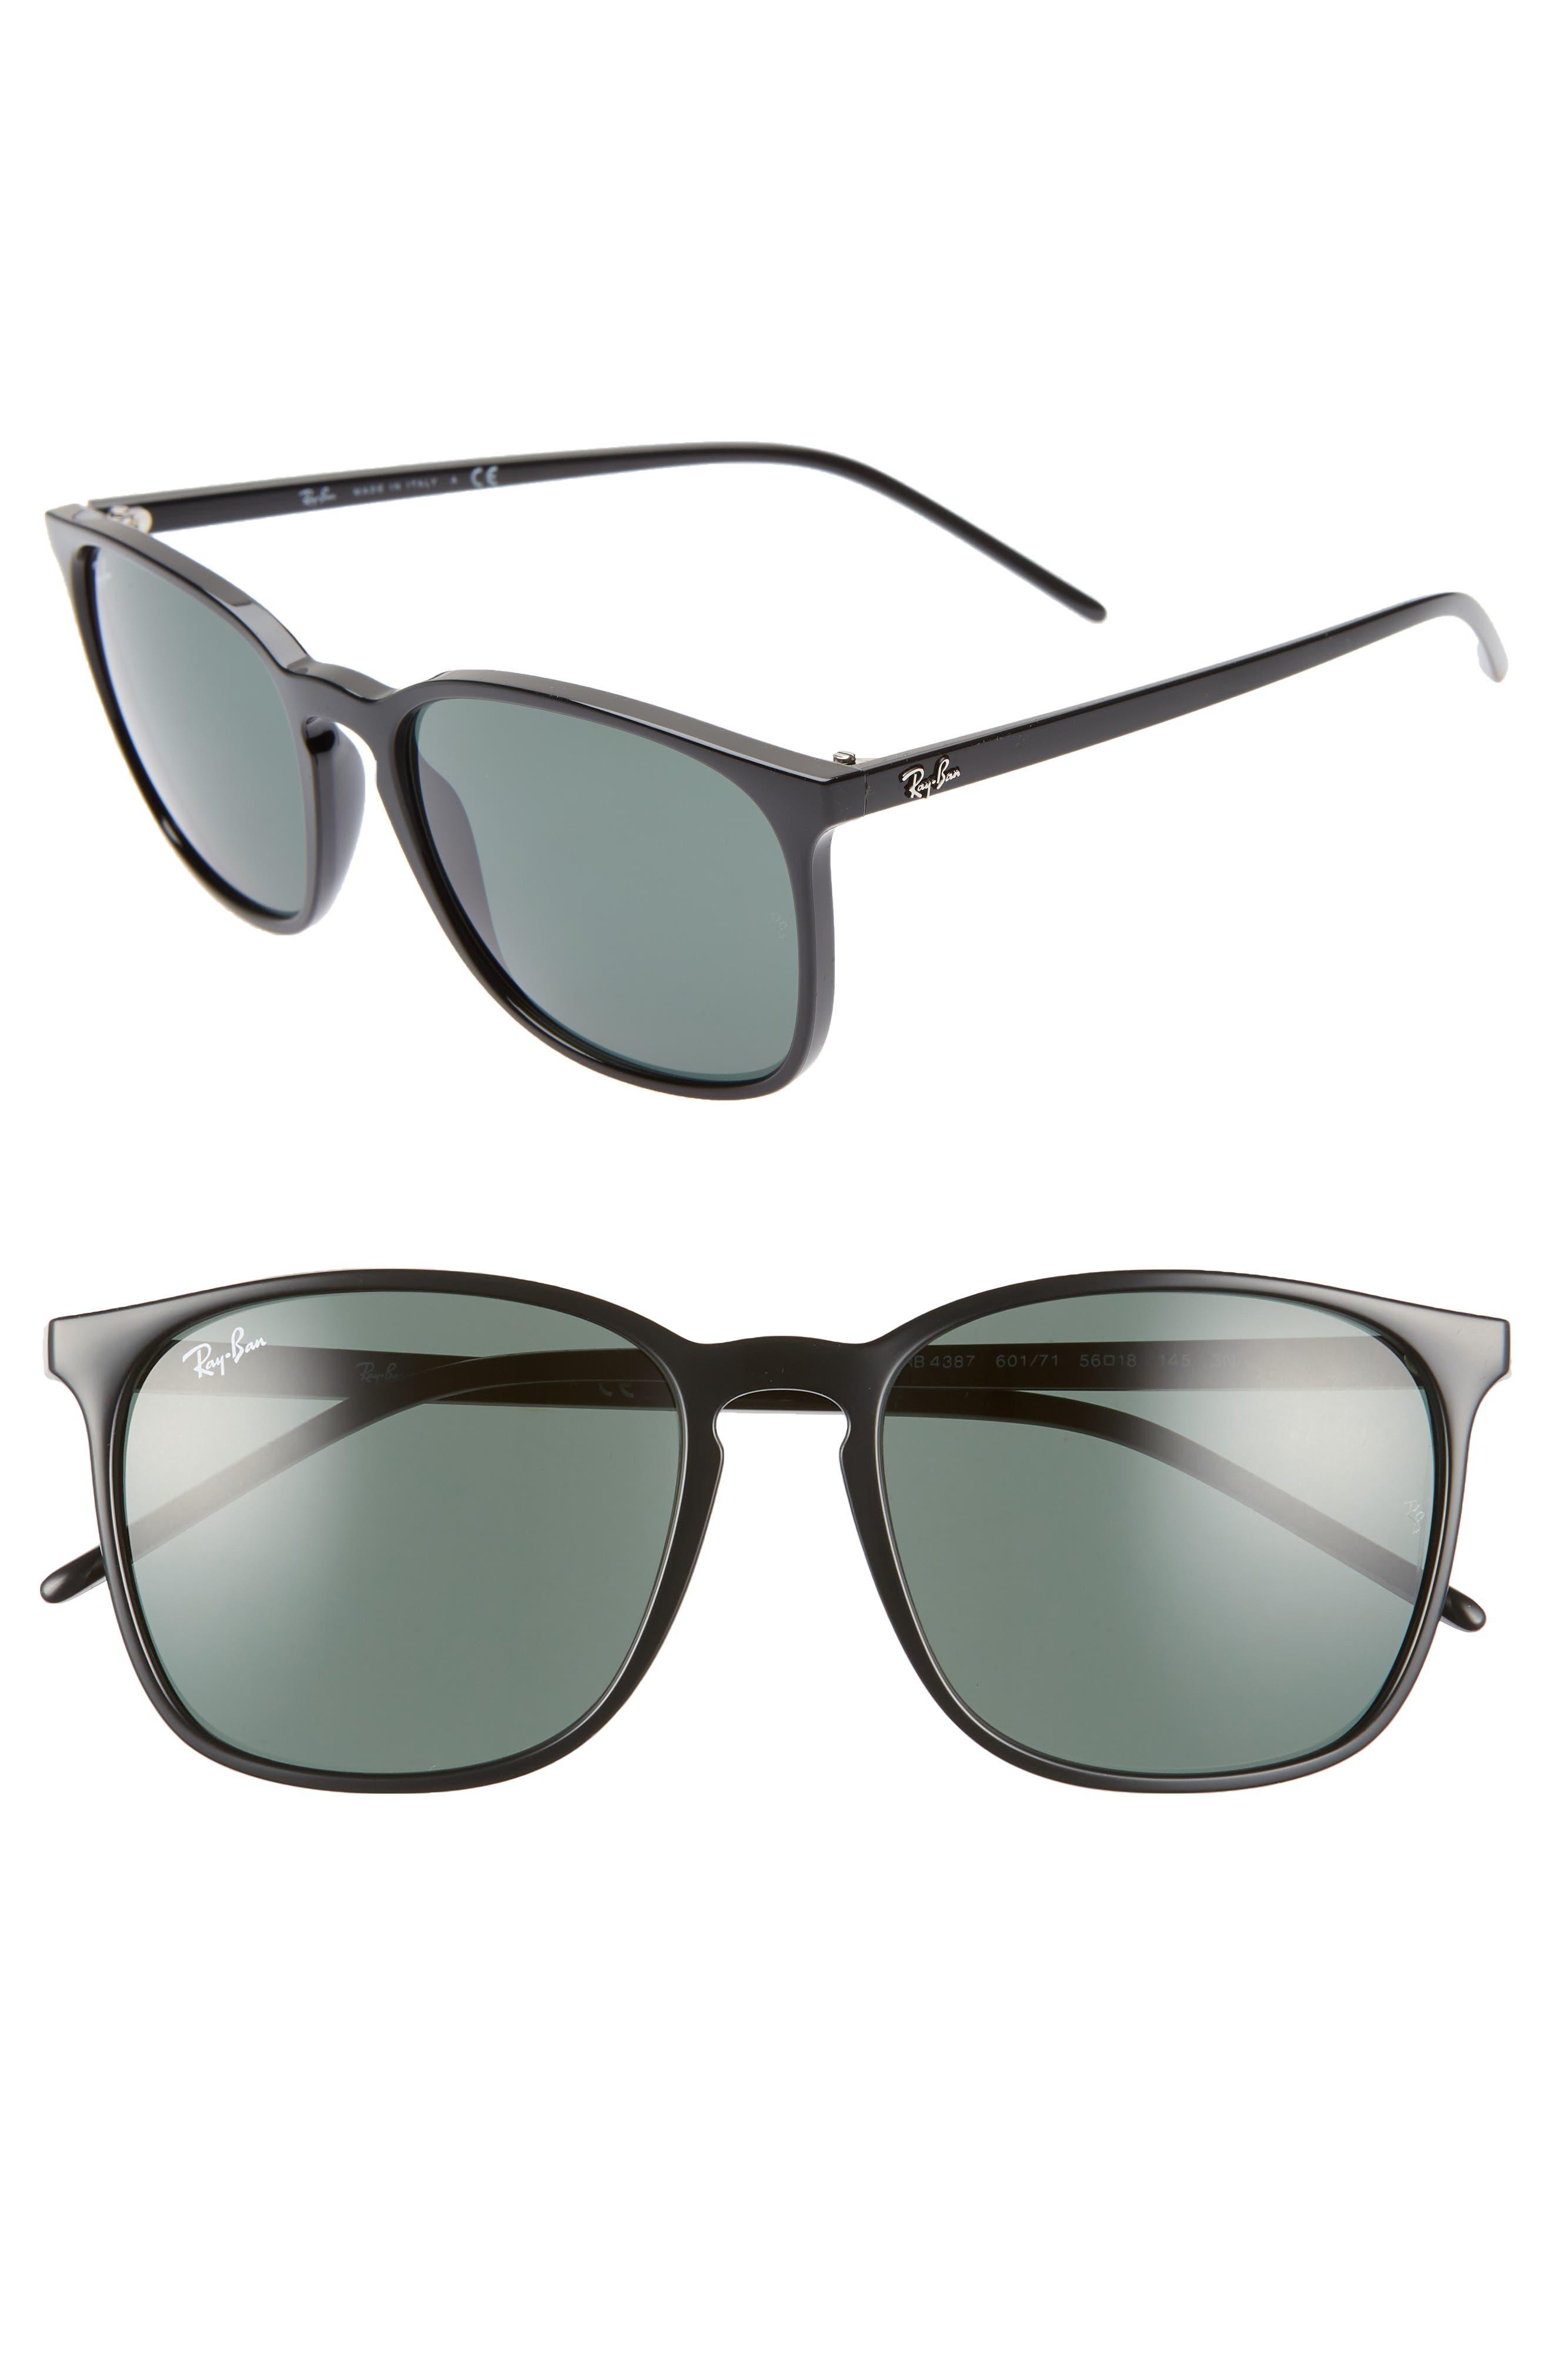 cfa659e043b7 Women's Sunglasses - Ray-Ban